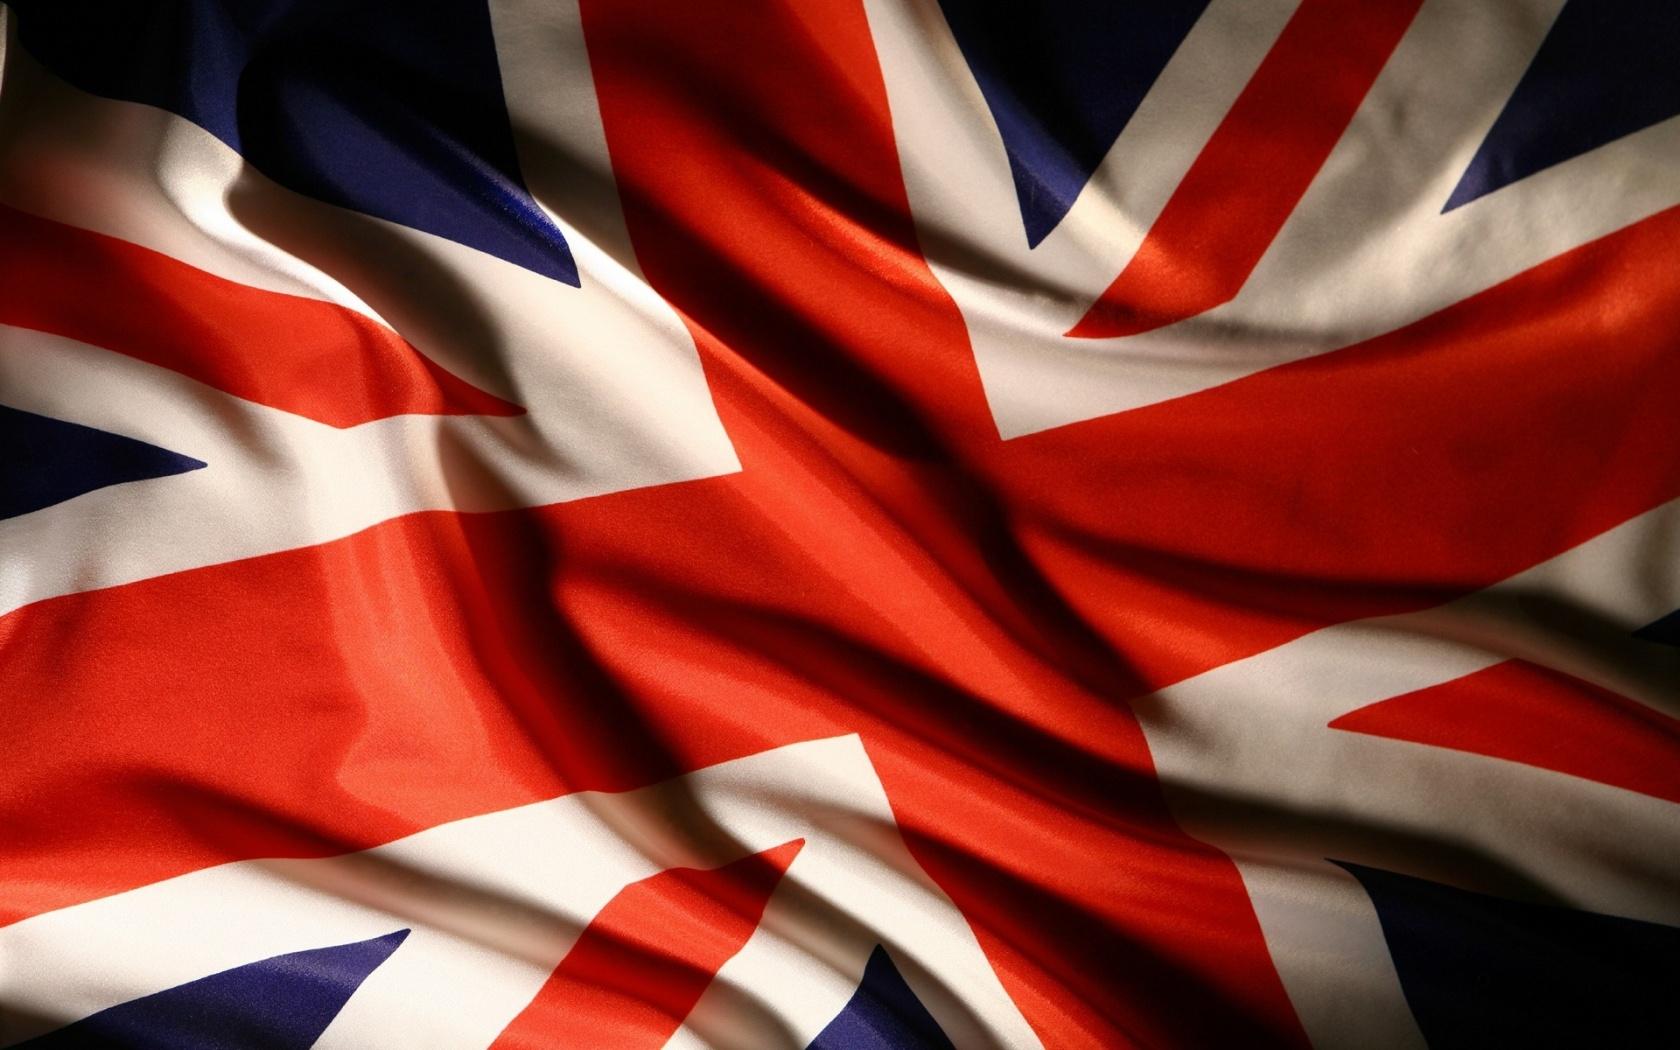 british flag wallpaper 1680x1050 World Wallpaper Collection 1680x1050